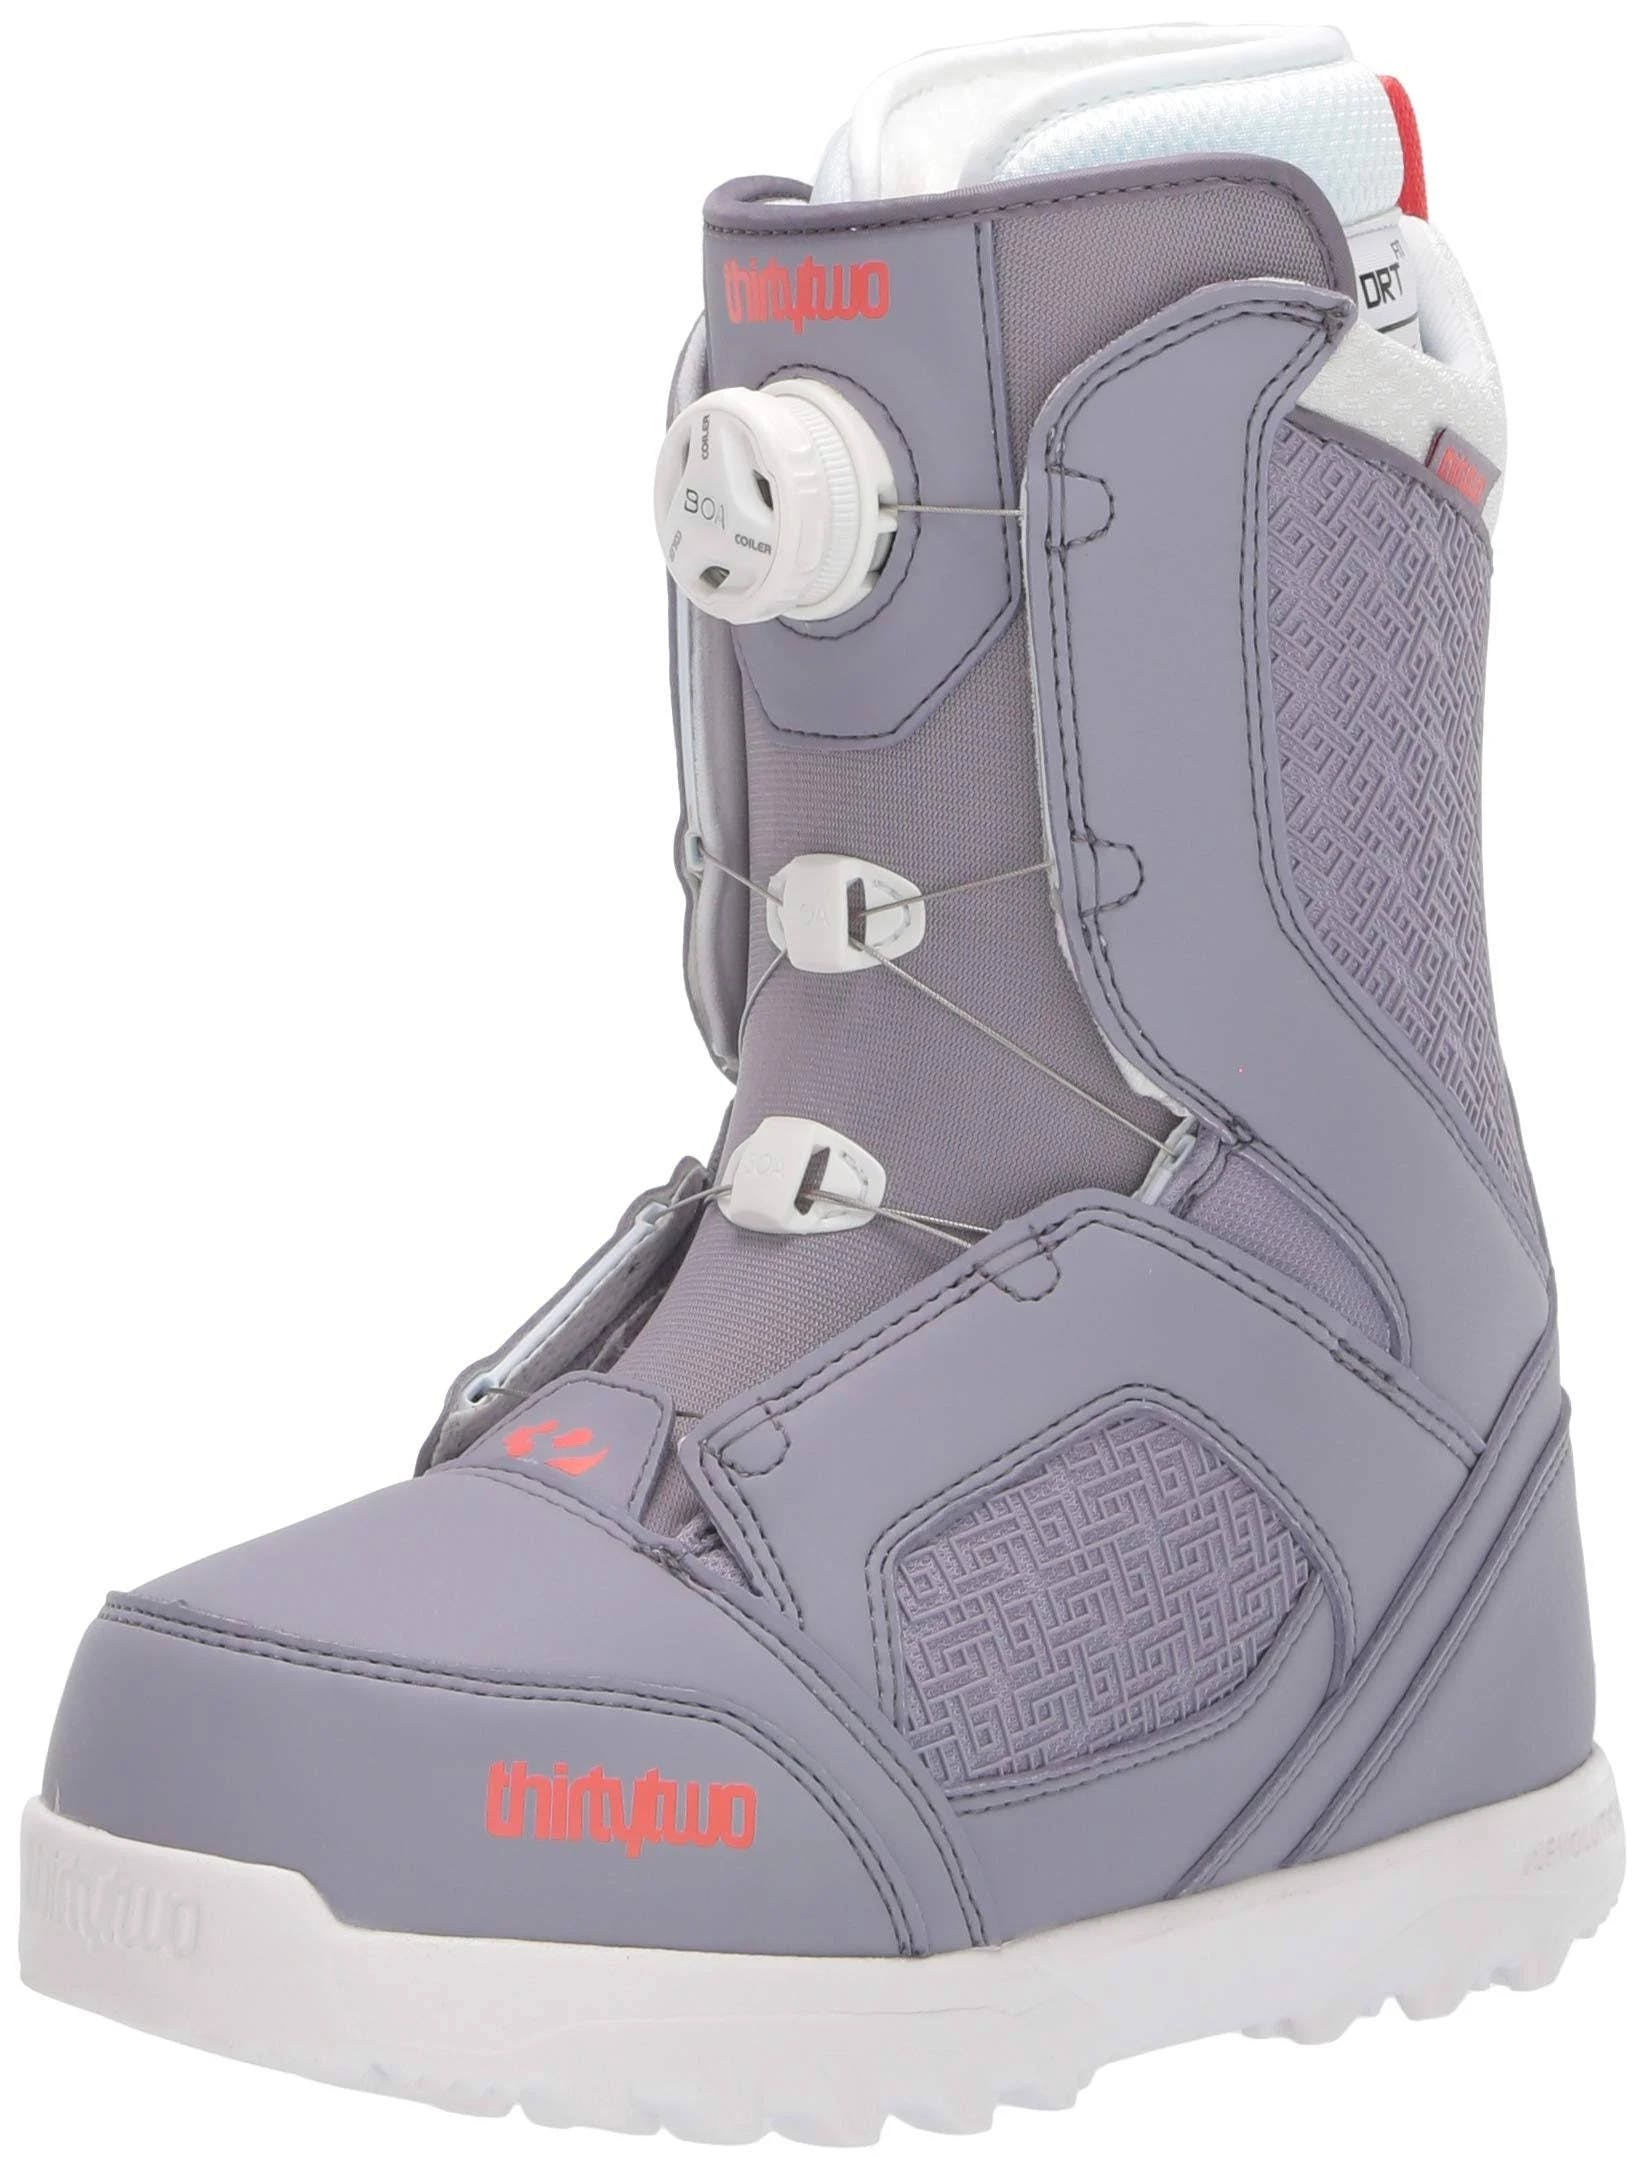 thirtytwo STW BOA Women's  Snowboard Boots · 2020